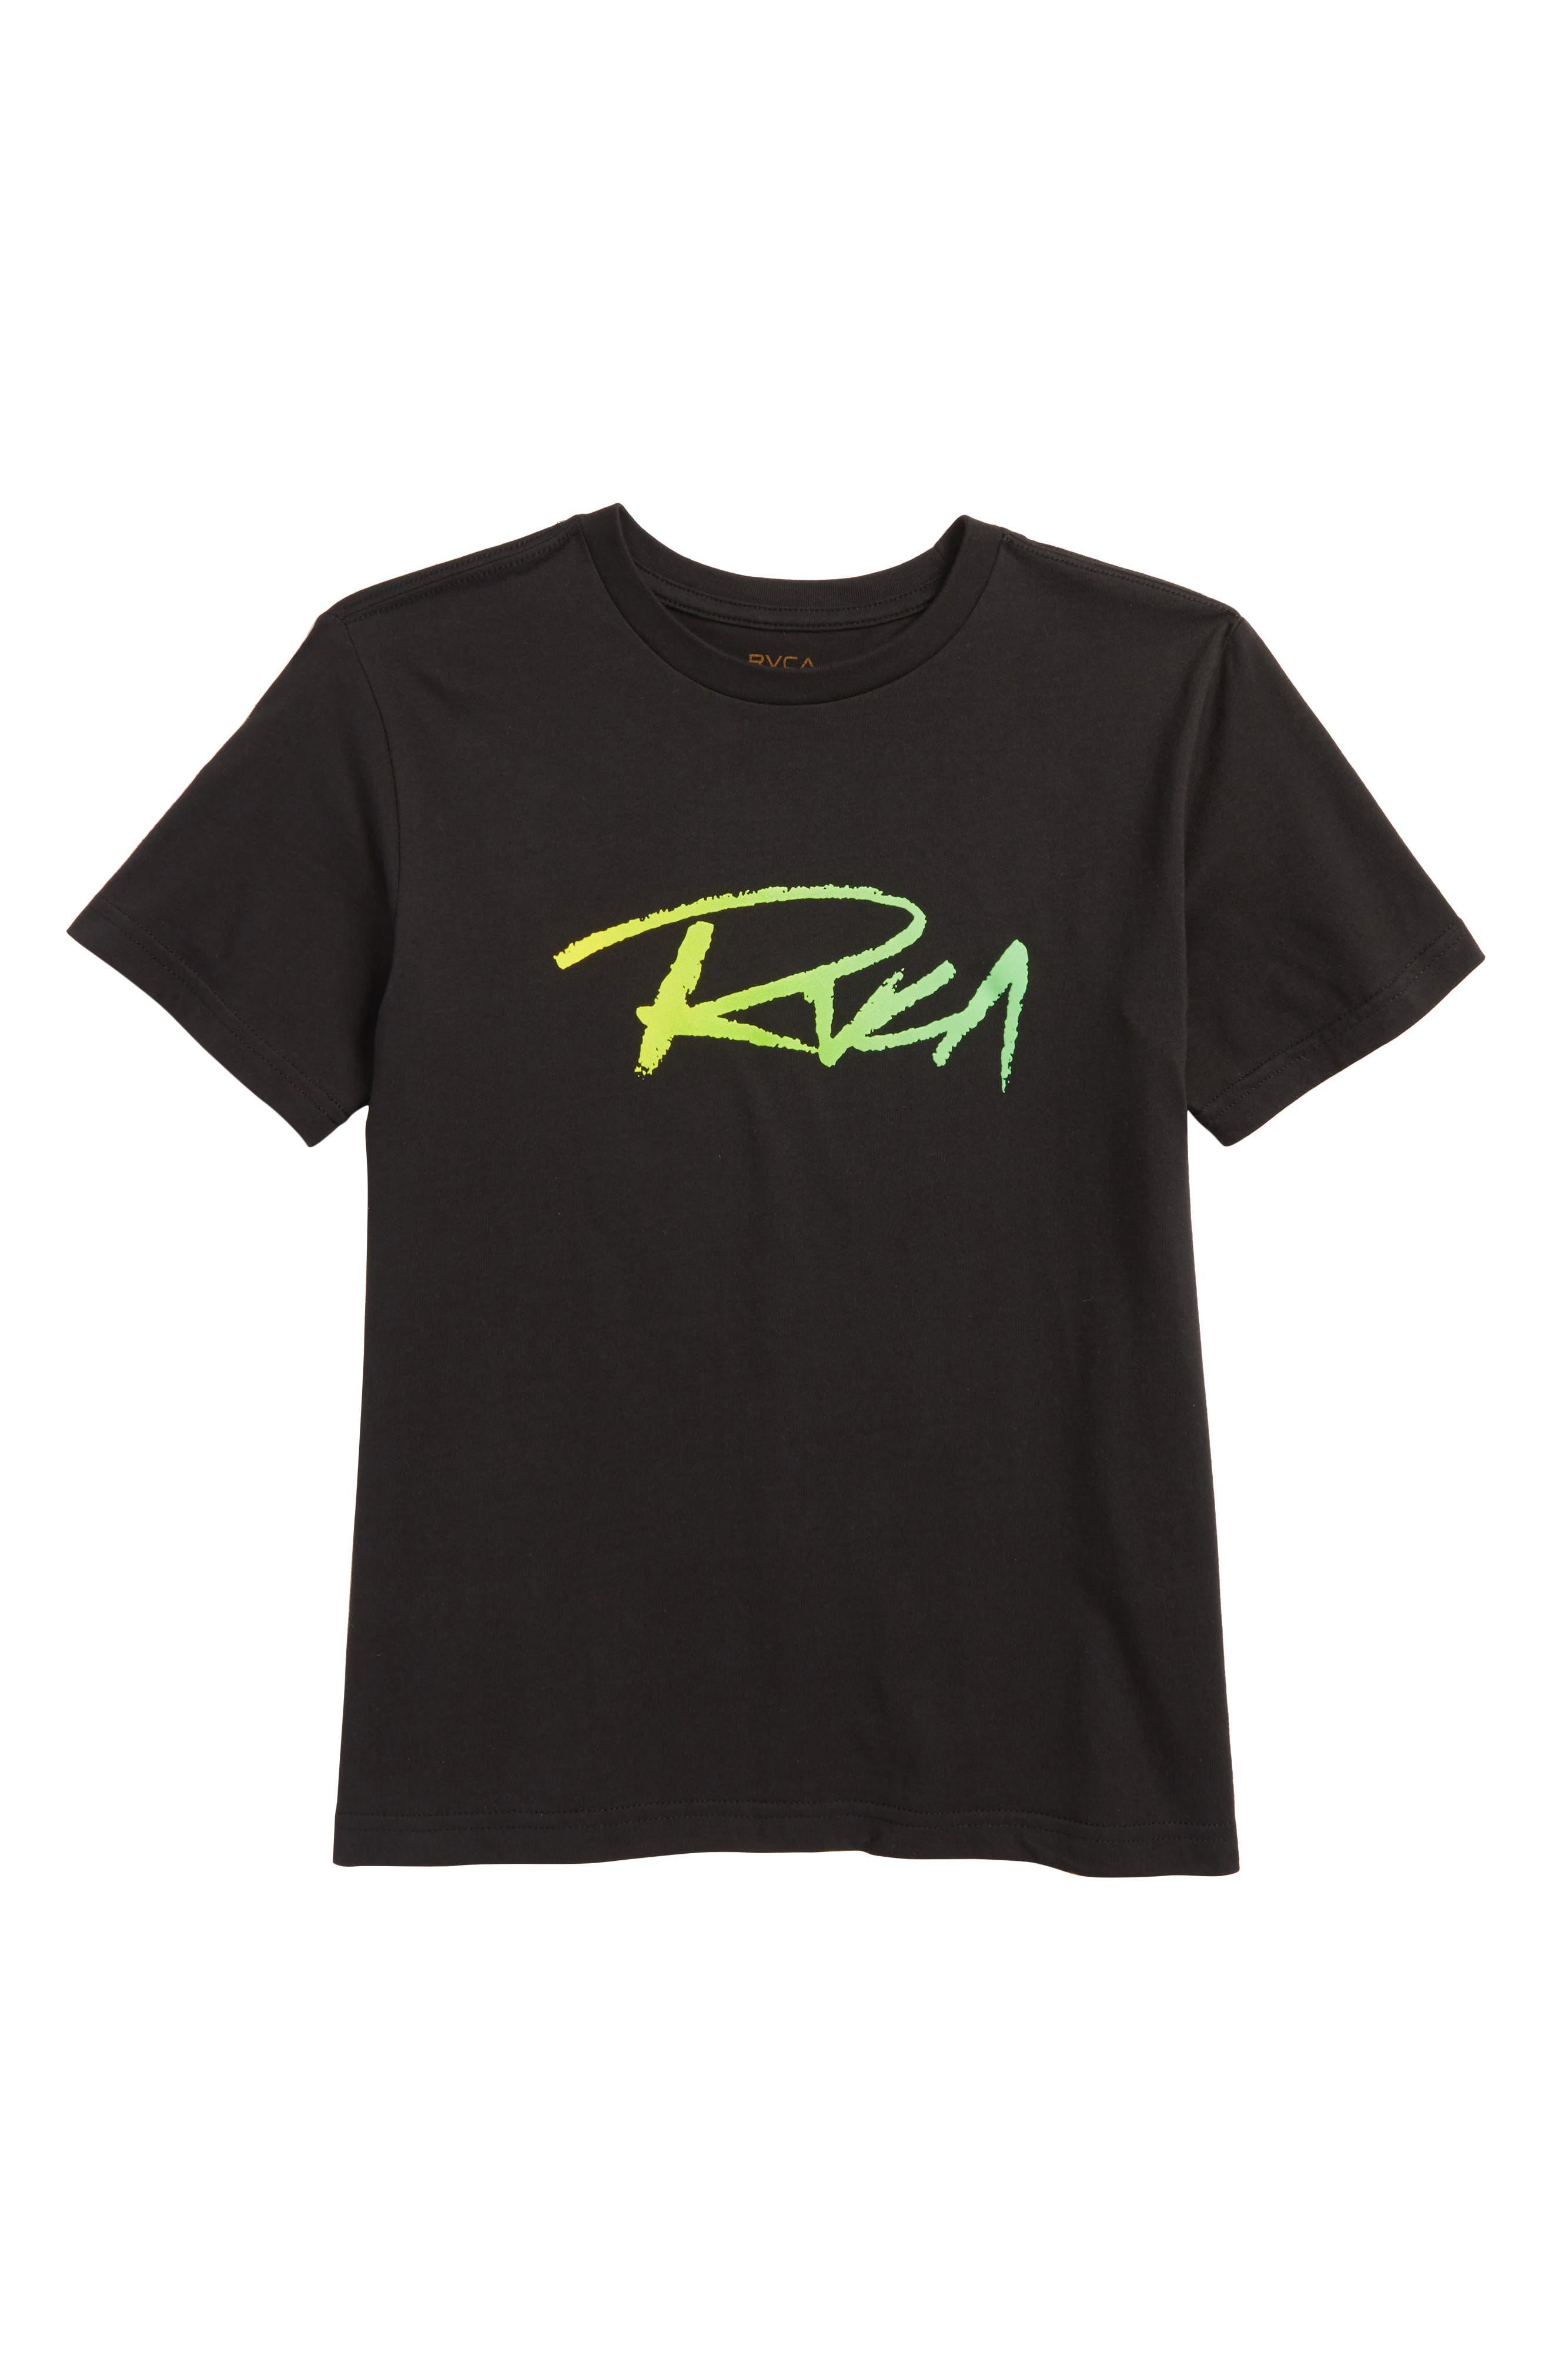 RVCA Skratch Graphic T-Shirt (Big Boys)